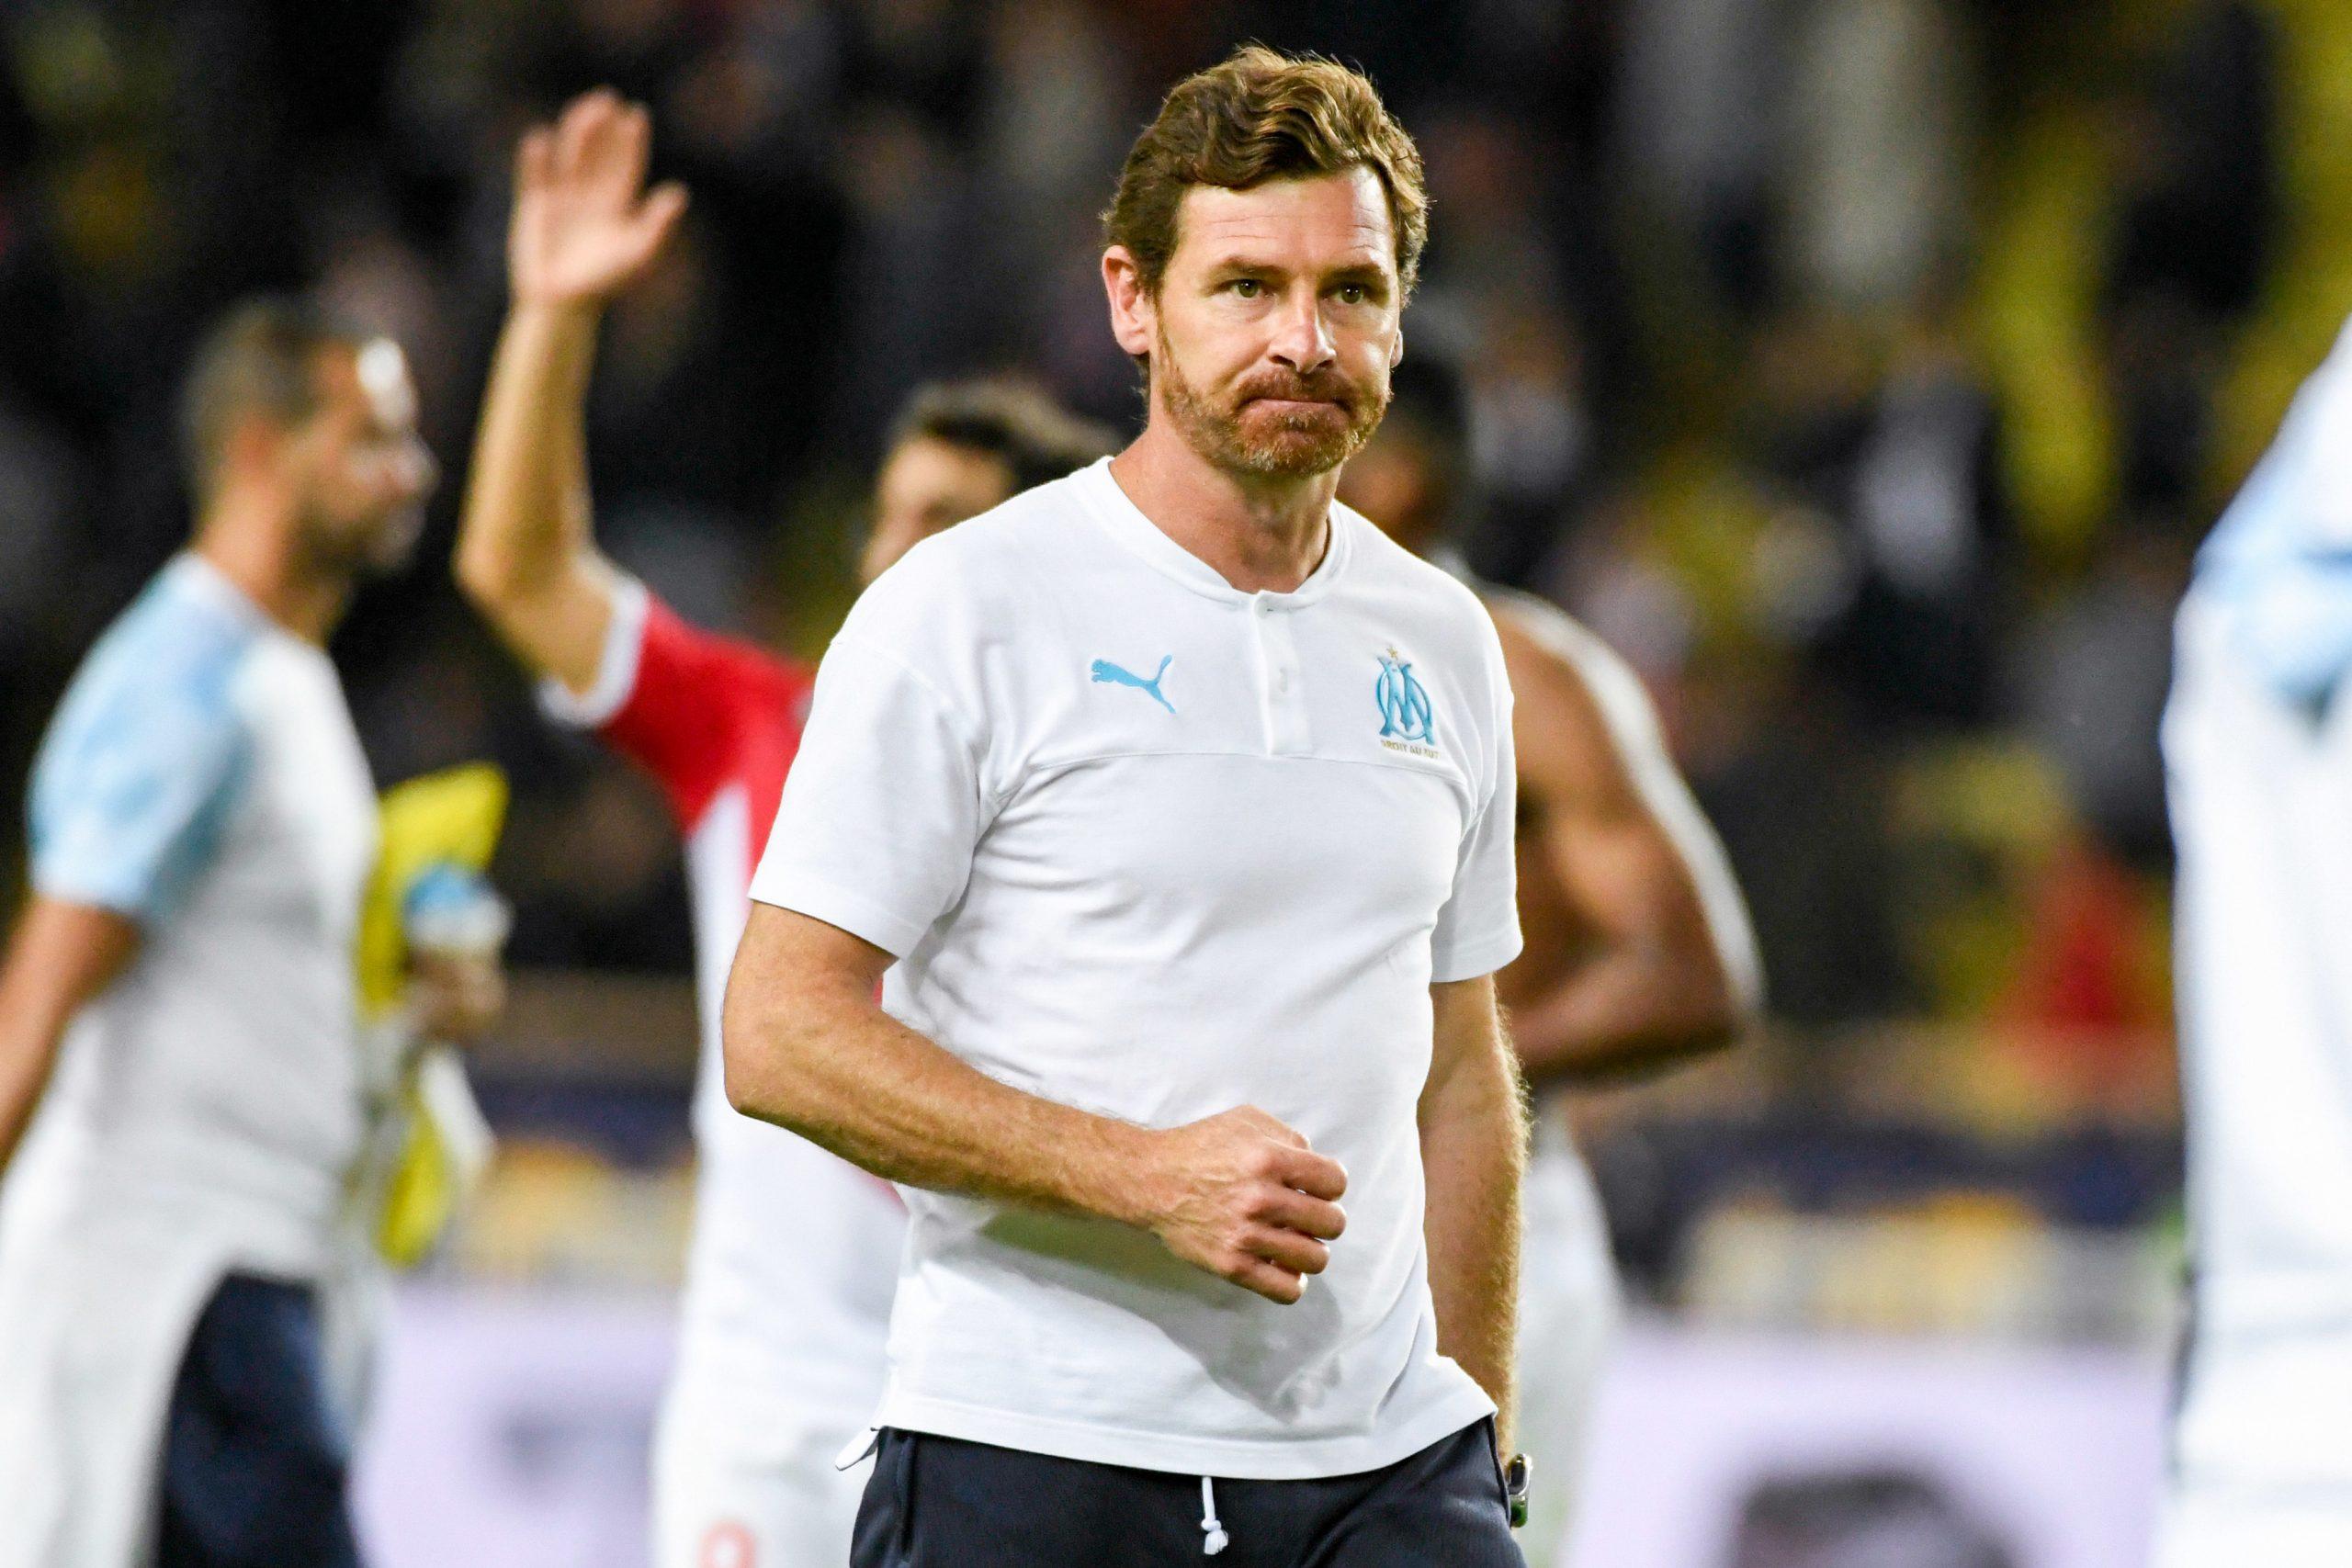 Mercato OM : Officiel - Villas-Boas reste à Marseille